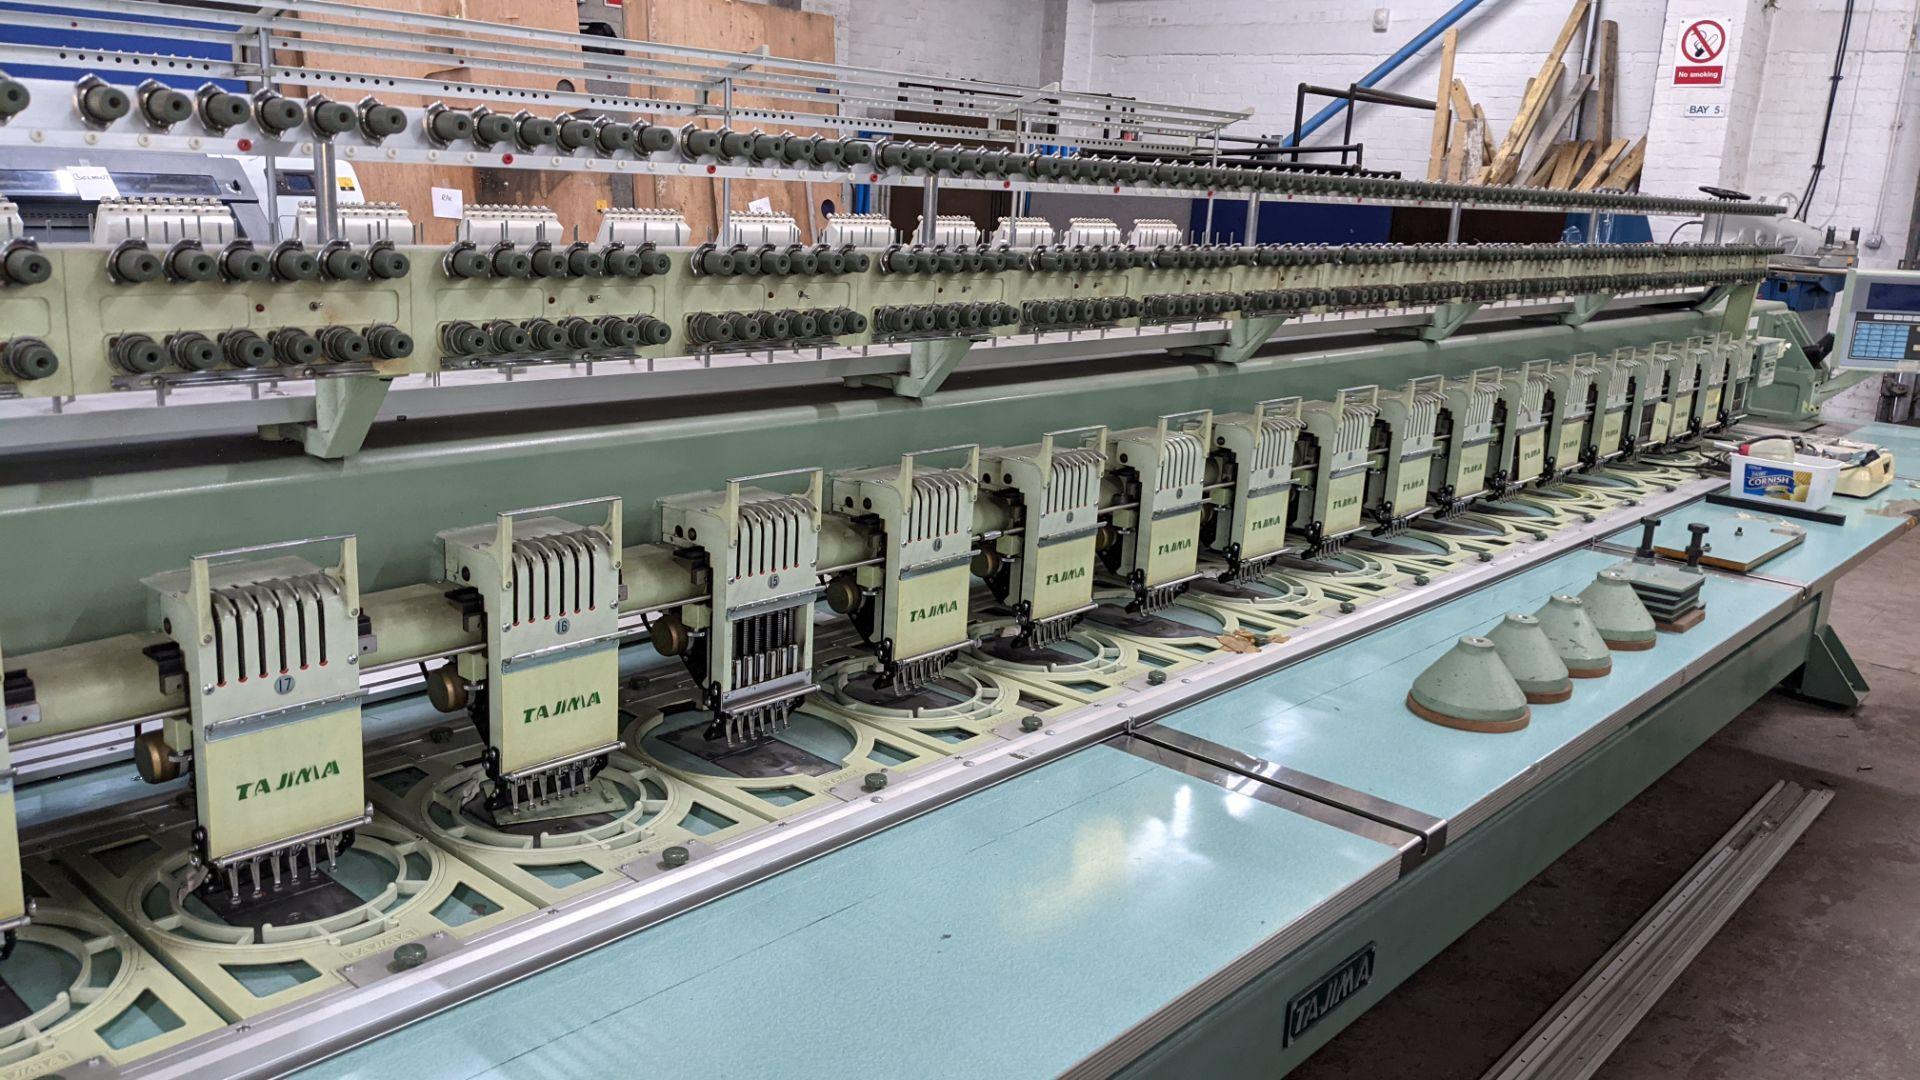 Tokai Tajima electronic 20 head automatic embroidery machine model TMEG-G620, manufacturing number 7 - Image 10 of 19